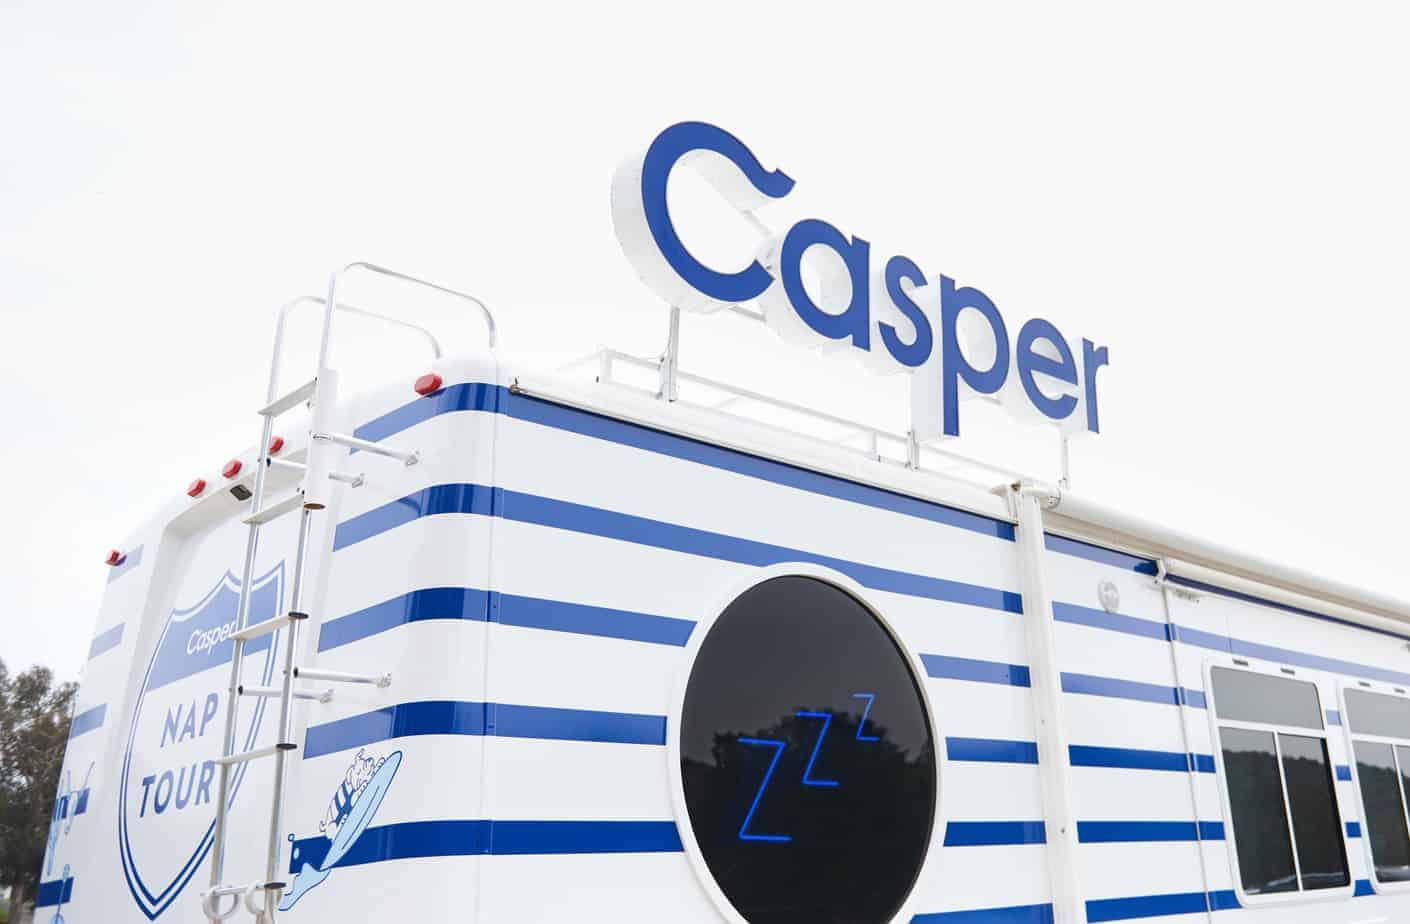 Caspar napmobile